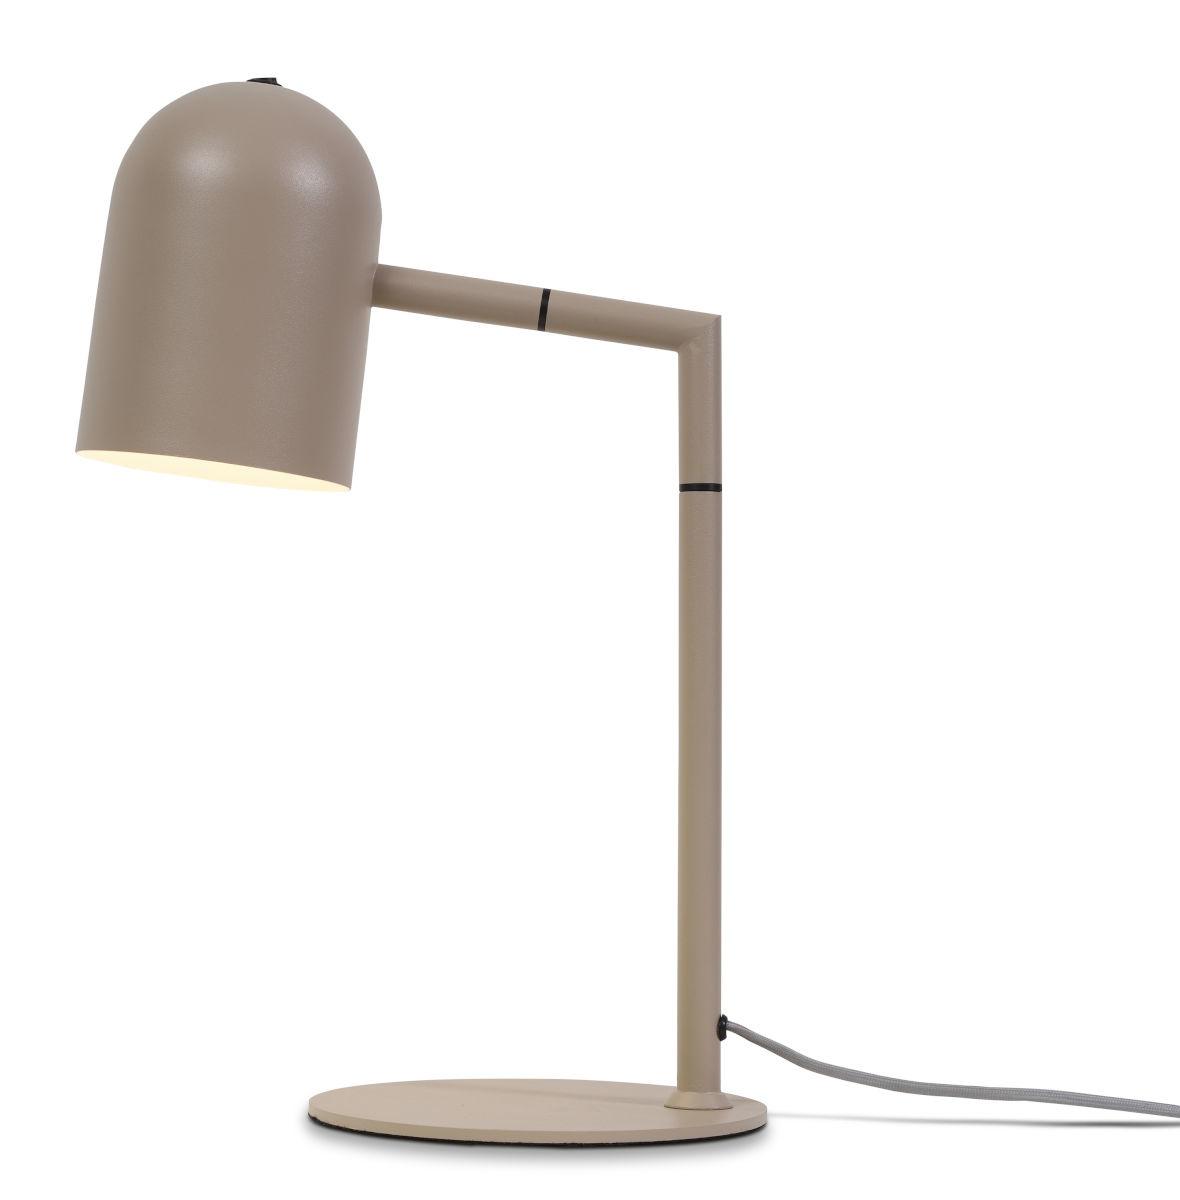 Tafellamp Marseille sand-1